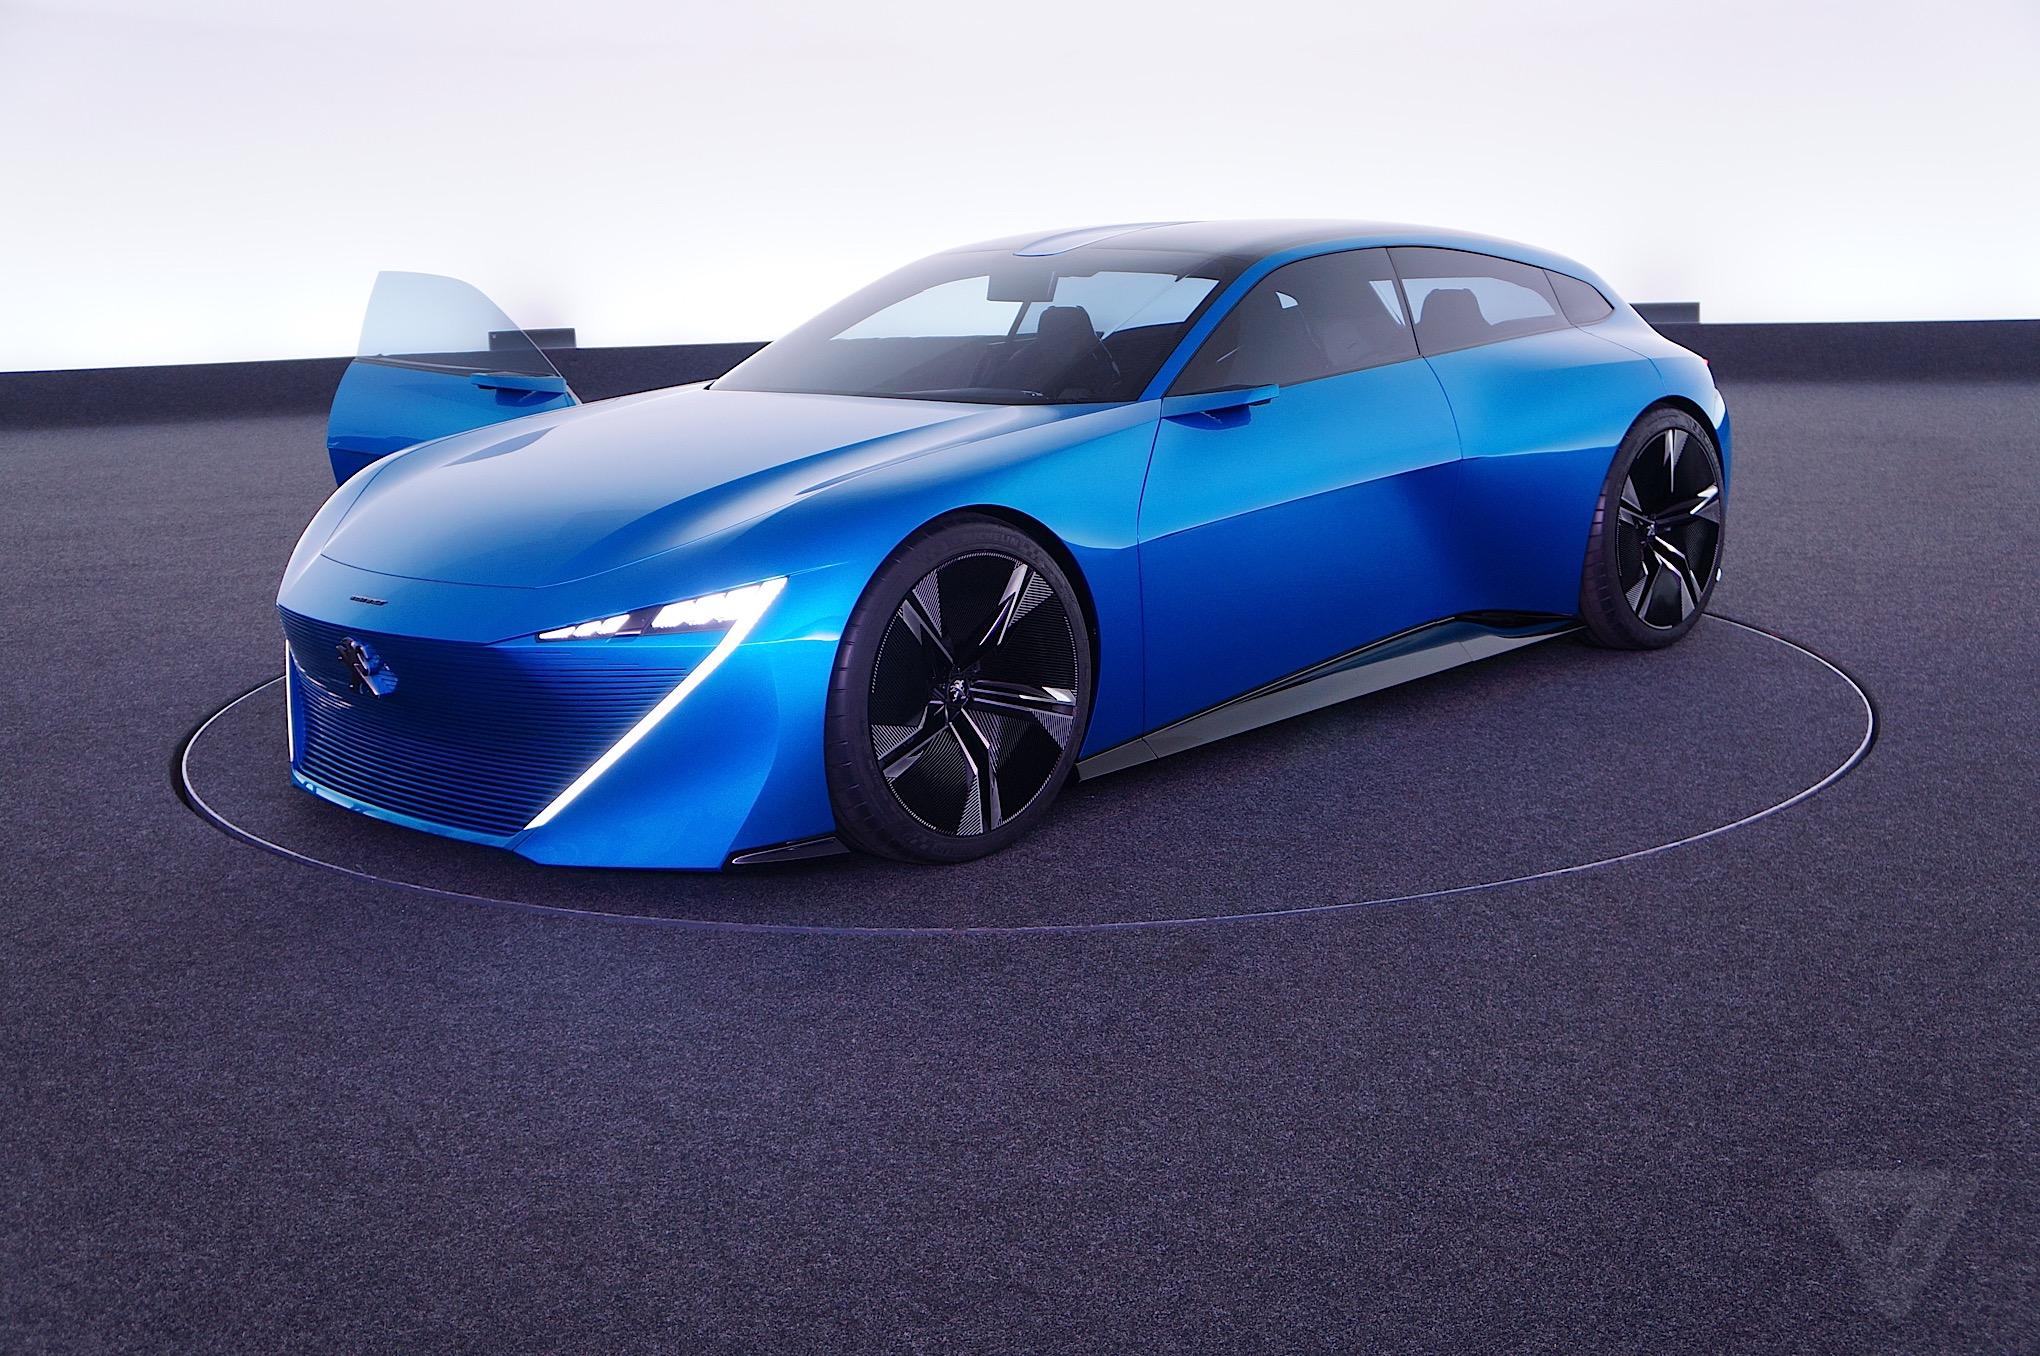 peugeot s instinct concept car is its vision of an autonomous near future the verge. Black Bedroom Furniture Sets. Home Design Ideas